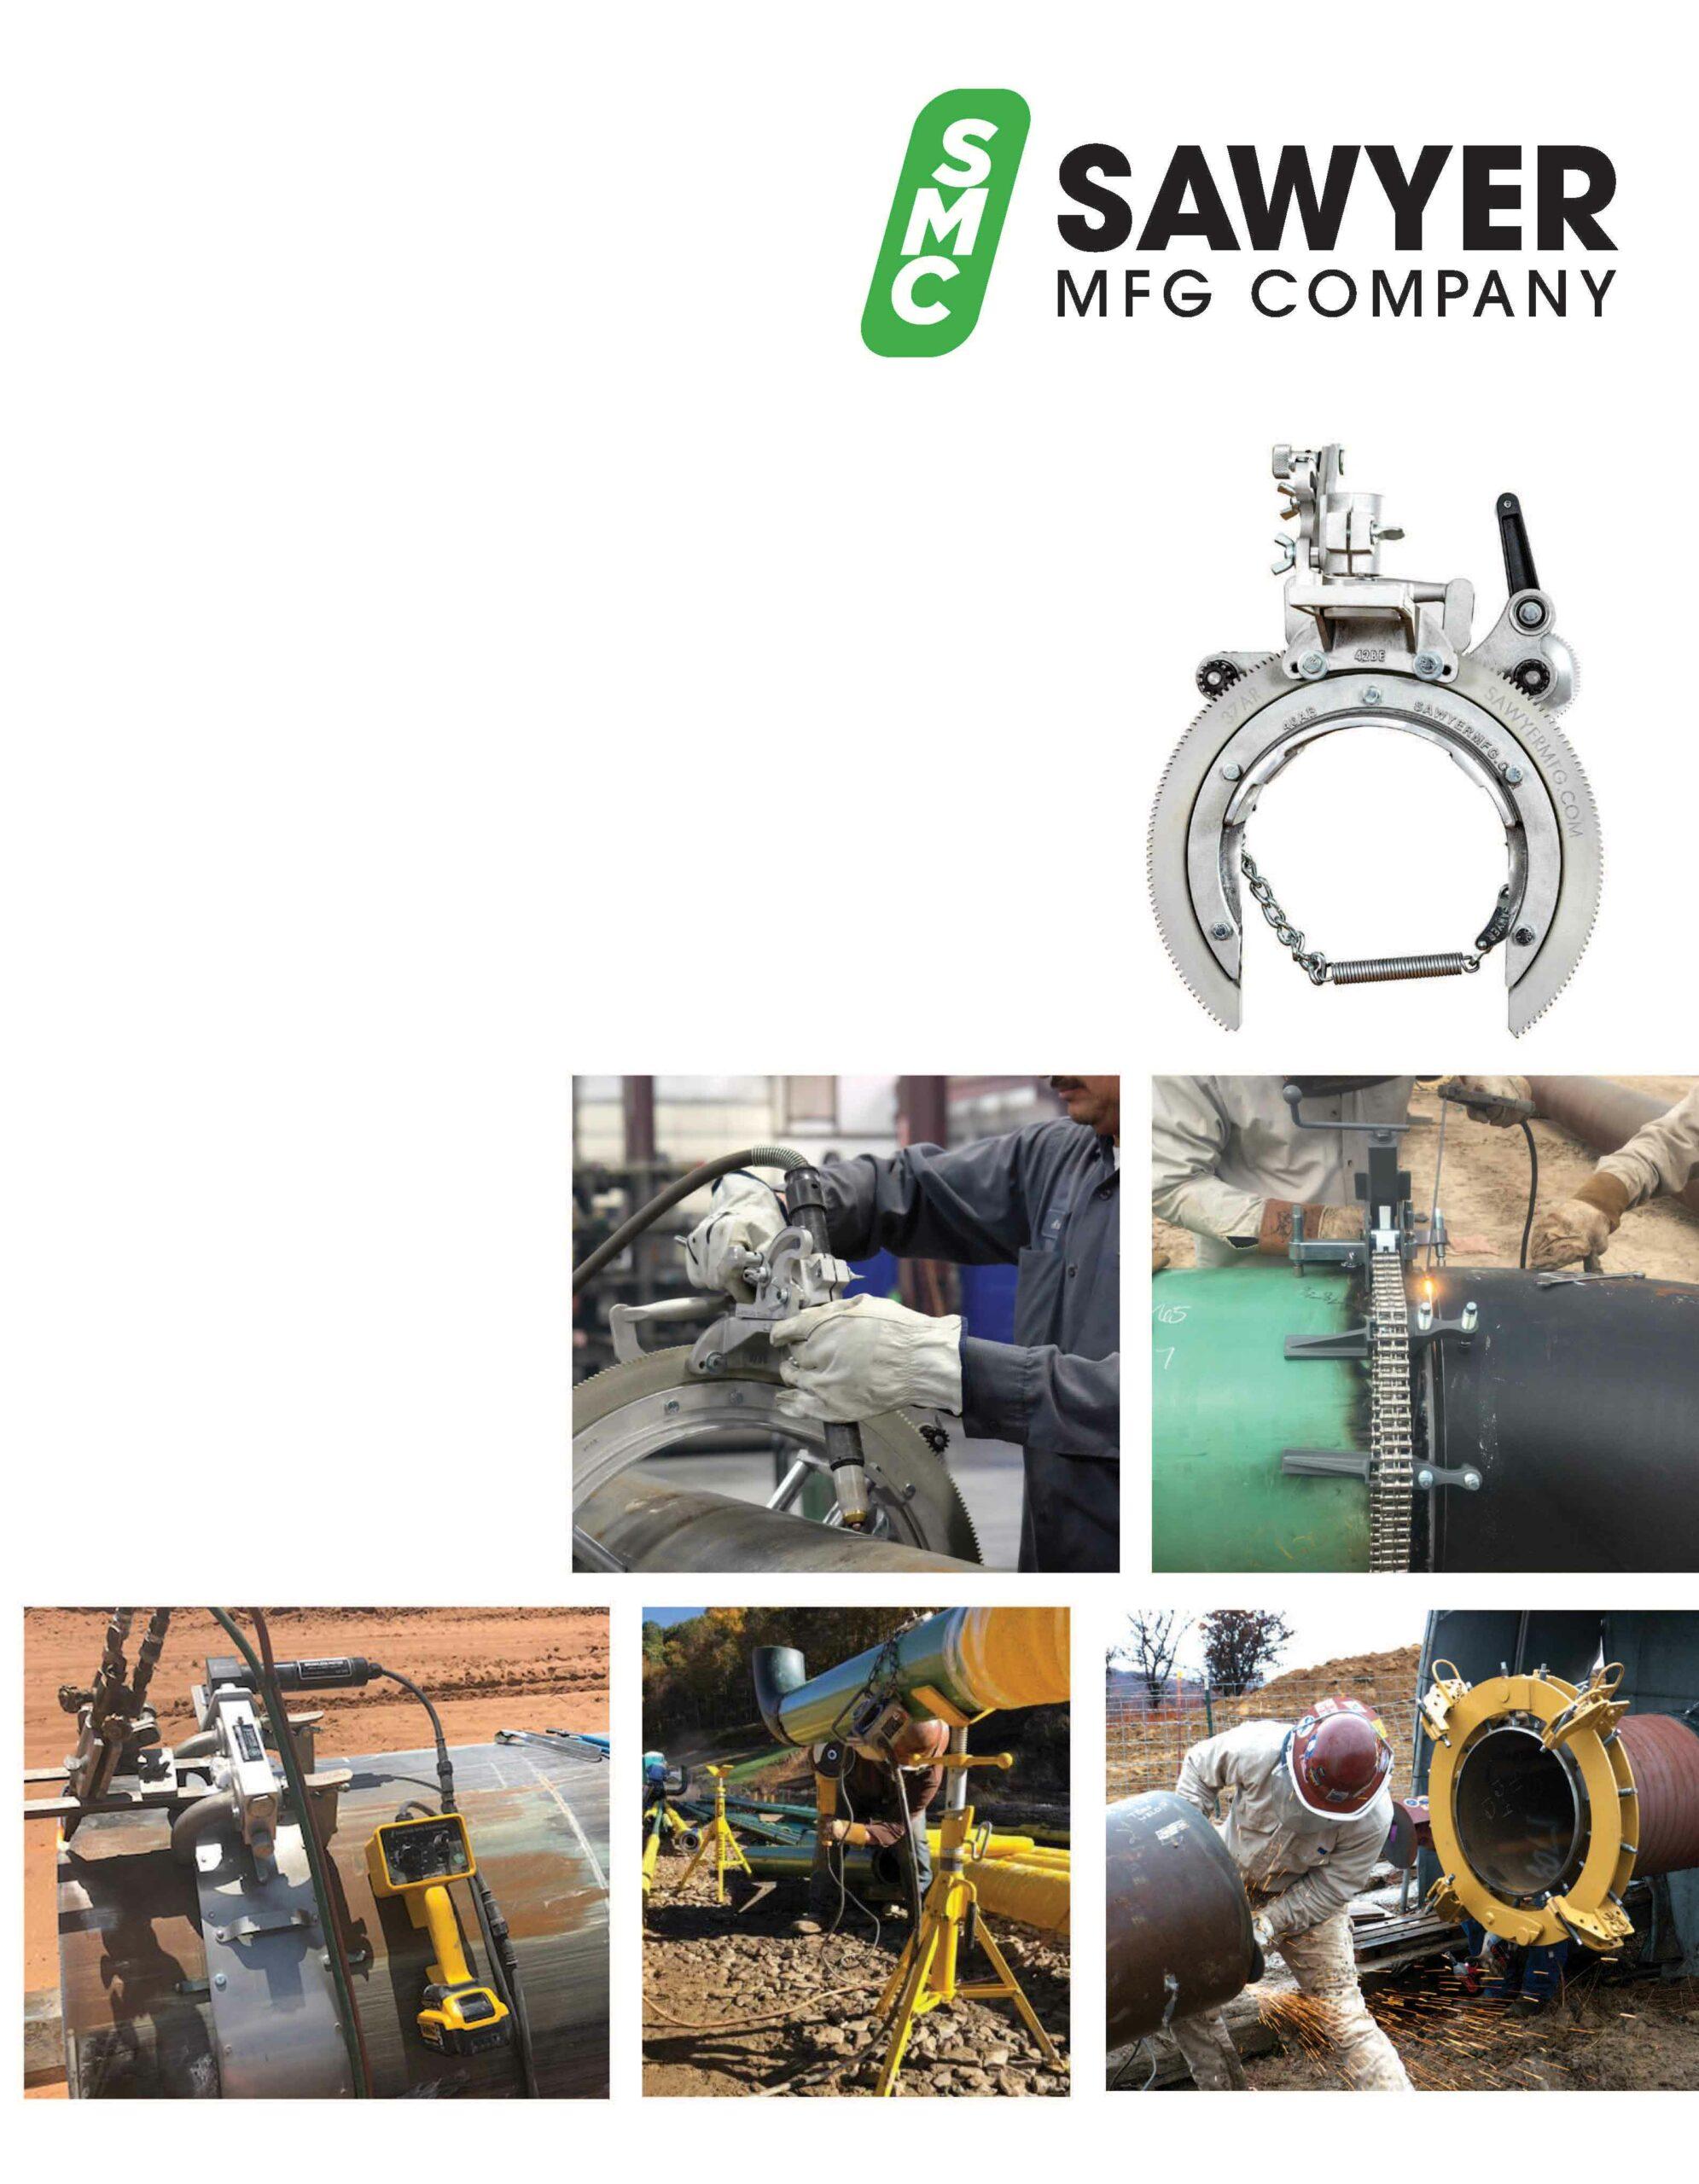 Sawyer-Mfg-Catalog-2020